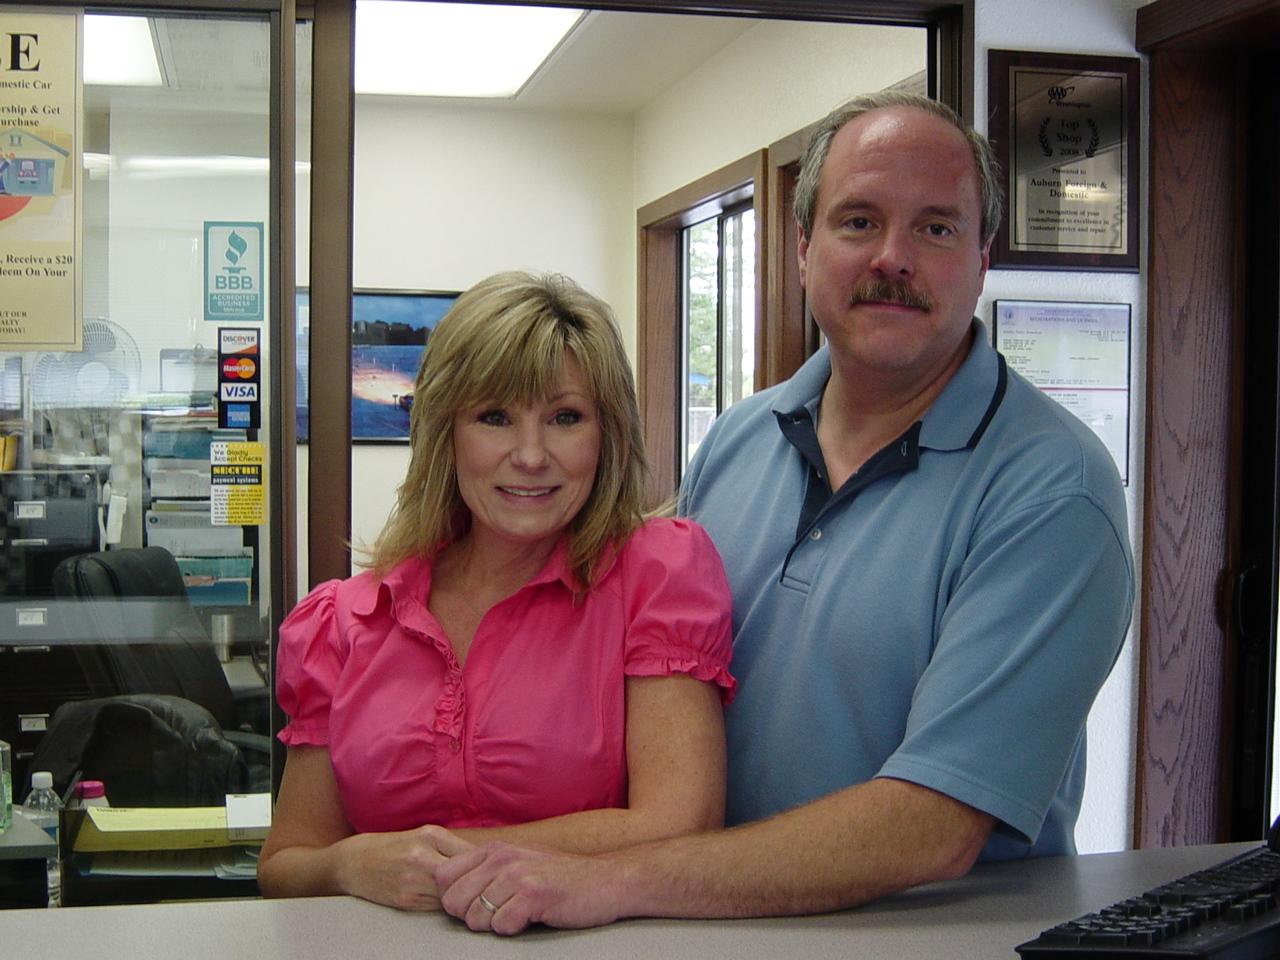 Greg & Julia, owners